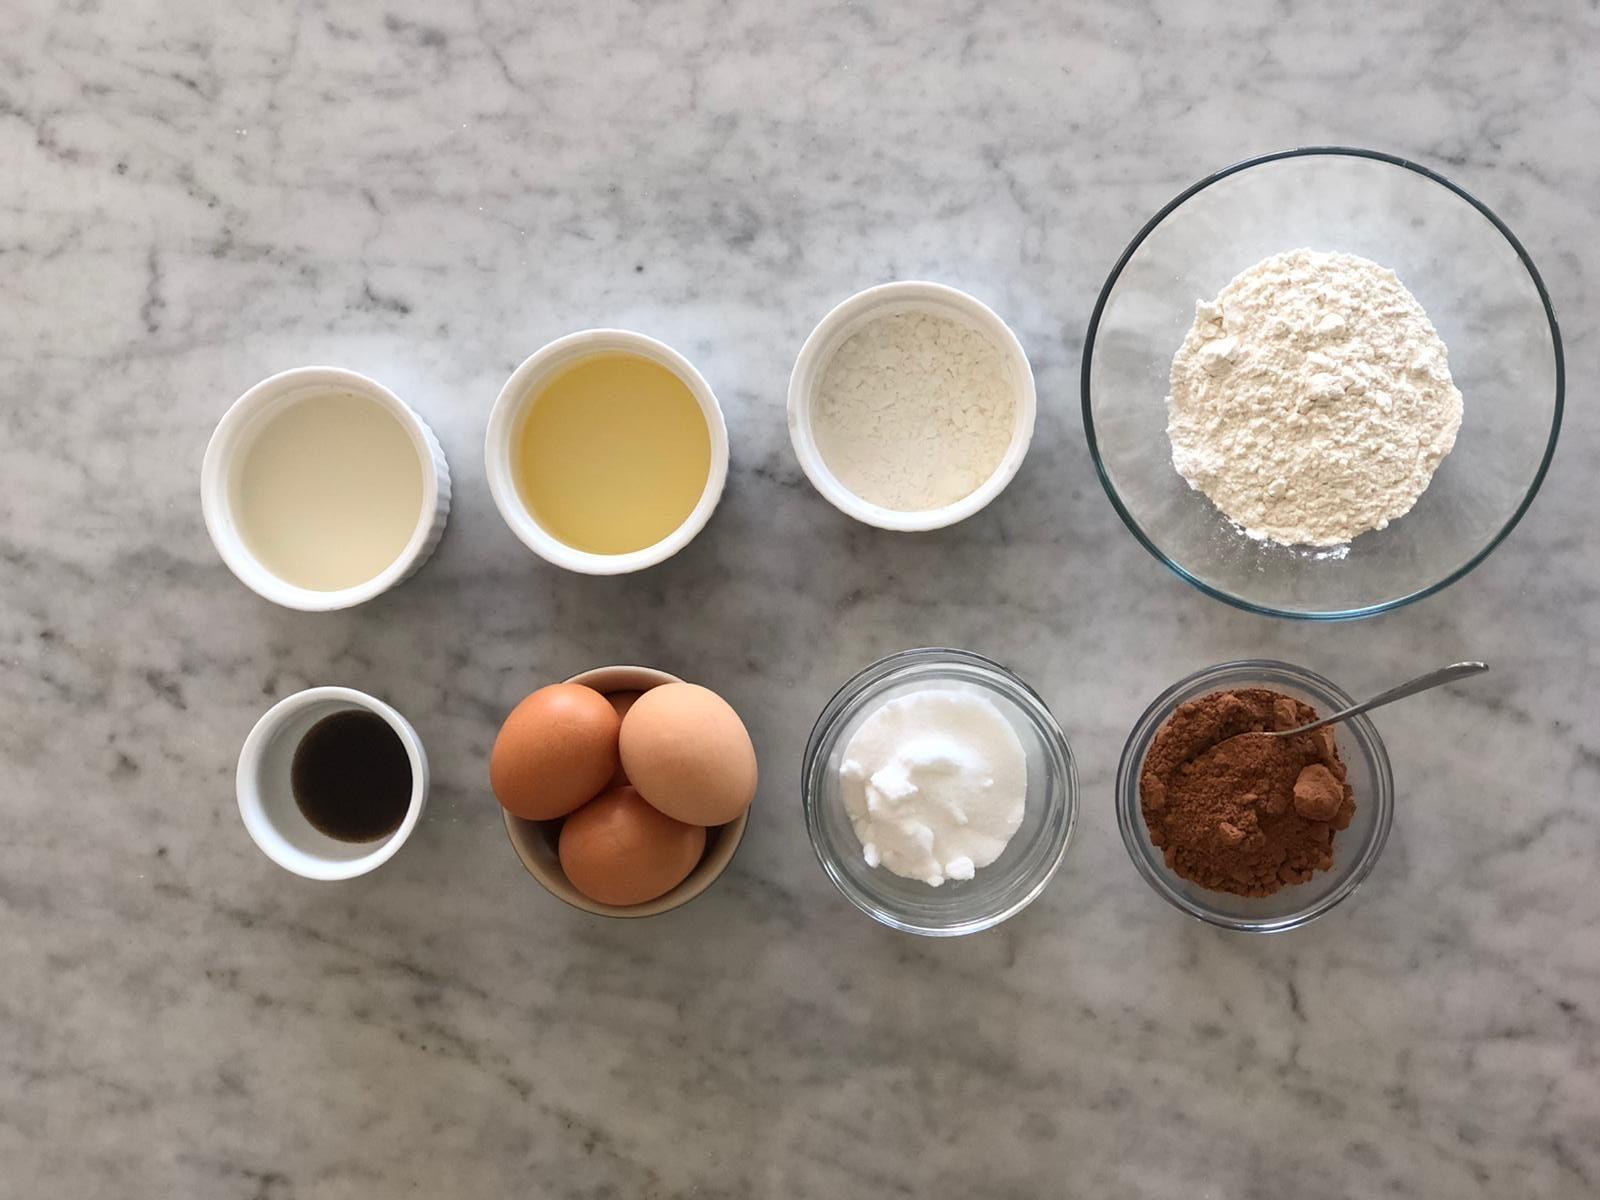 Sponge Cake Ingredients